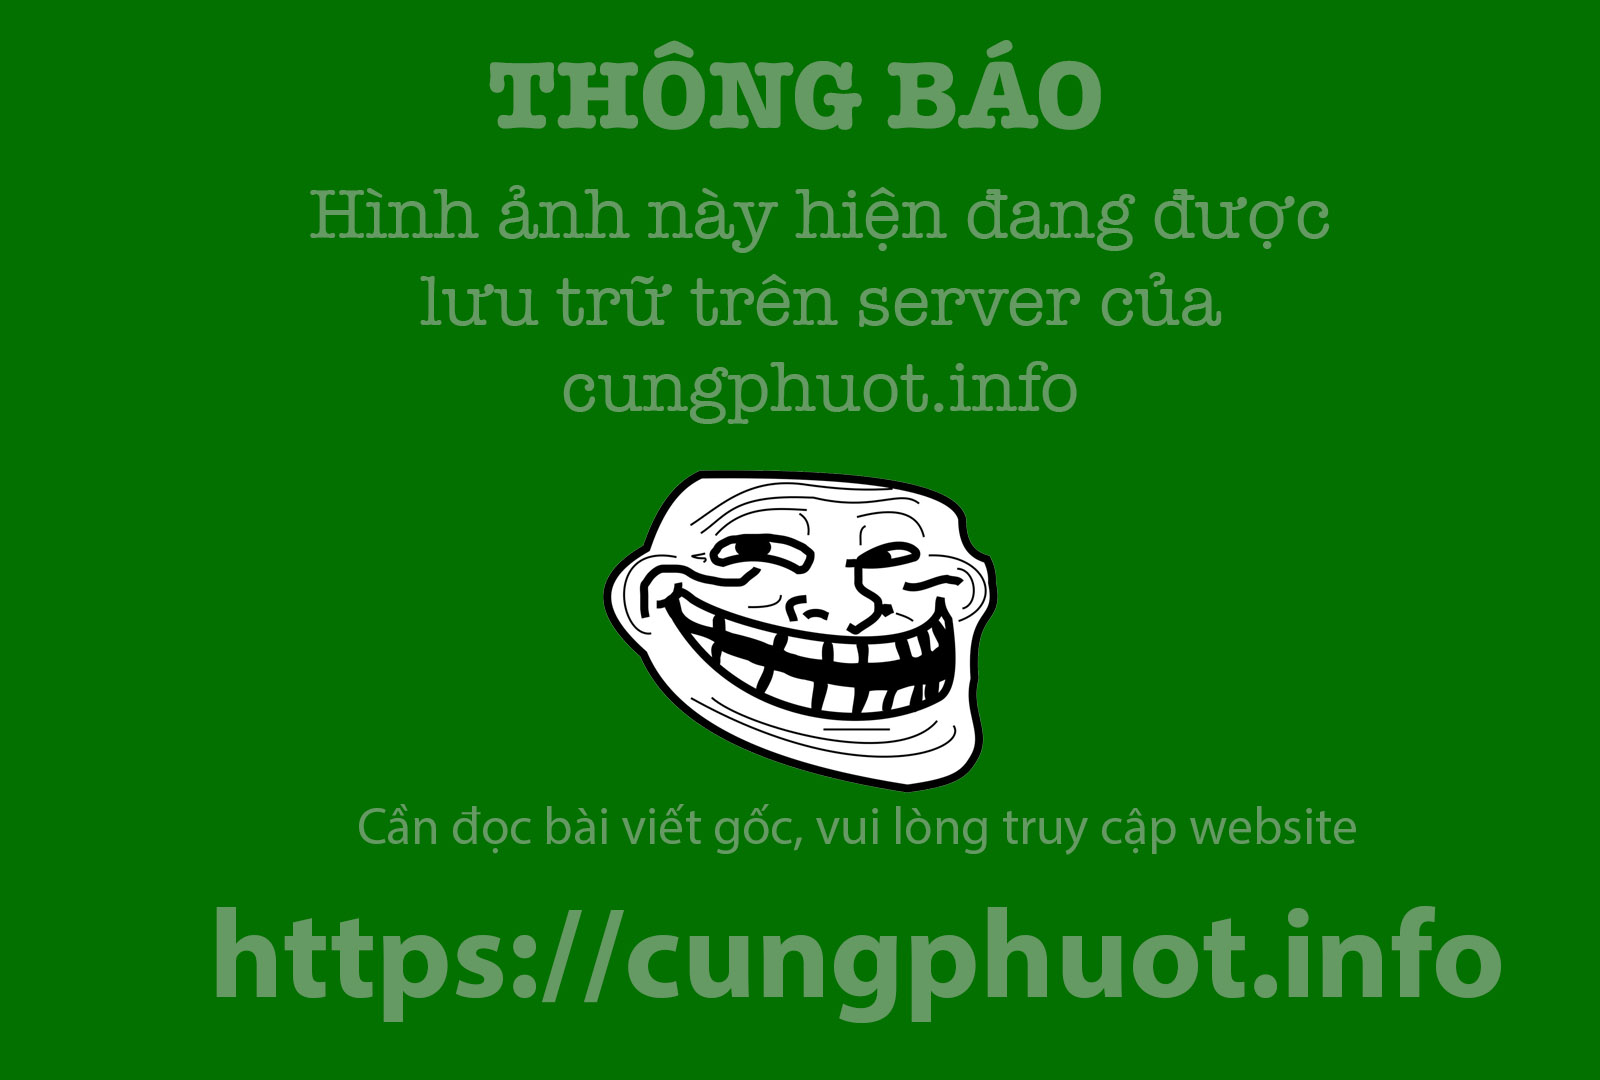 nhung-tiem-ca-phe-dep-phai-di-mot-lan-cho-biet-o-da-nang-ivivu-3